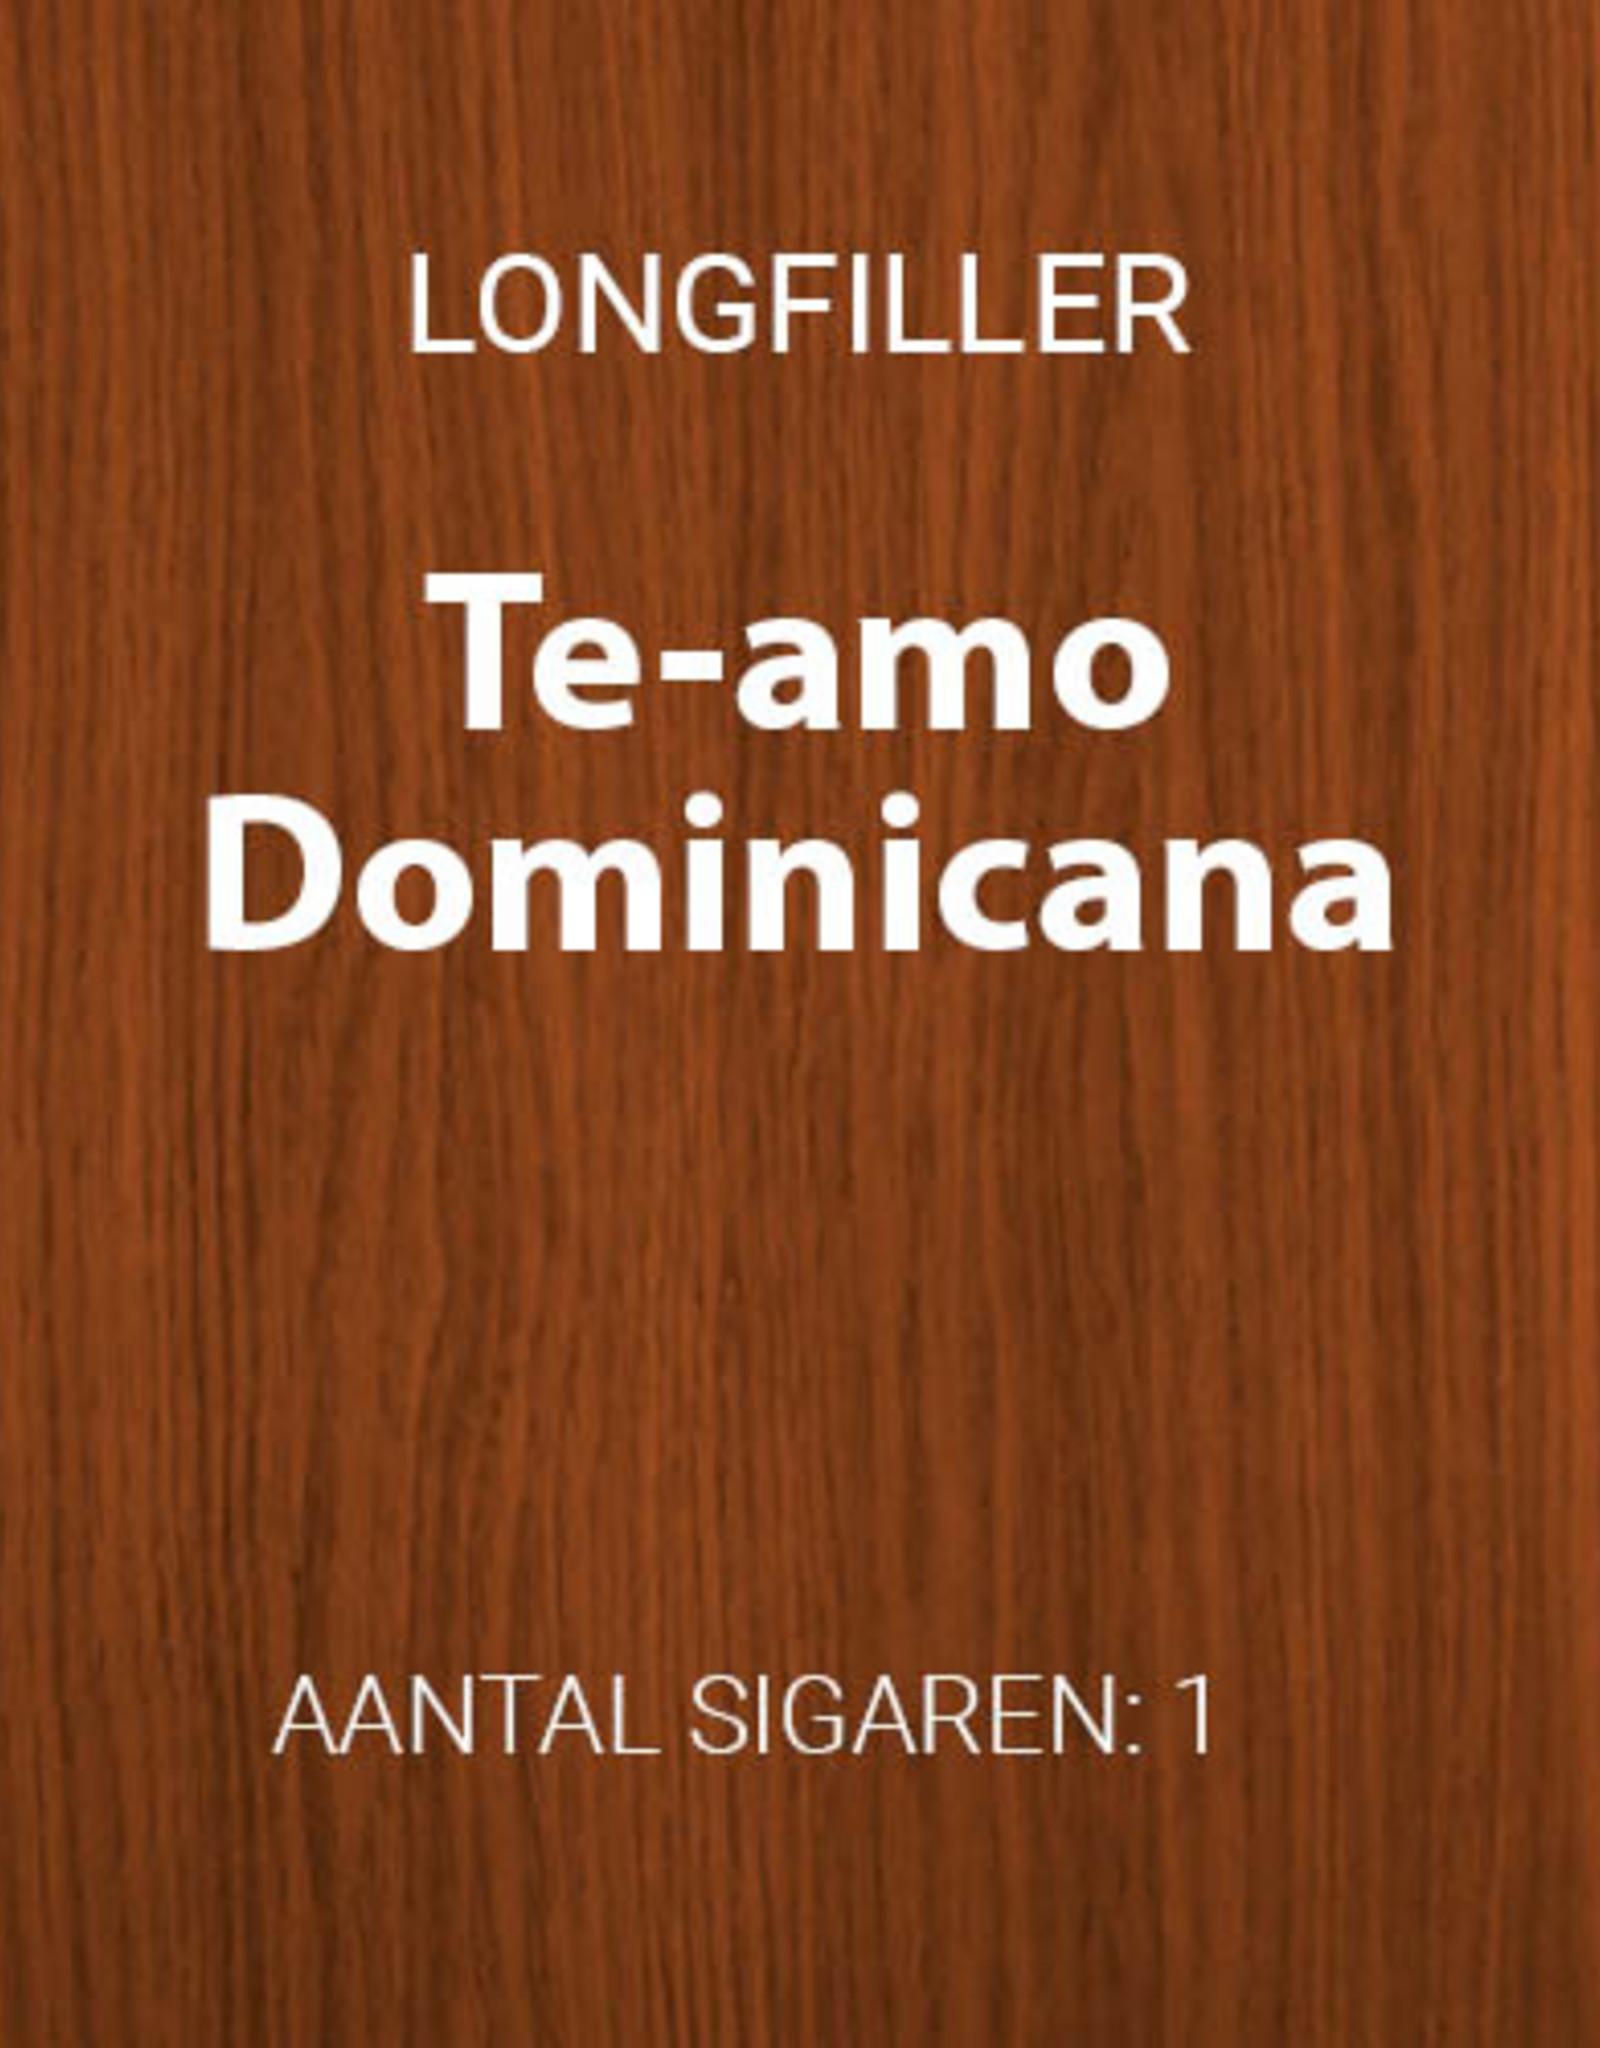 Te-Amo Dominicana longfiller